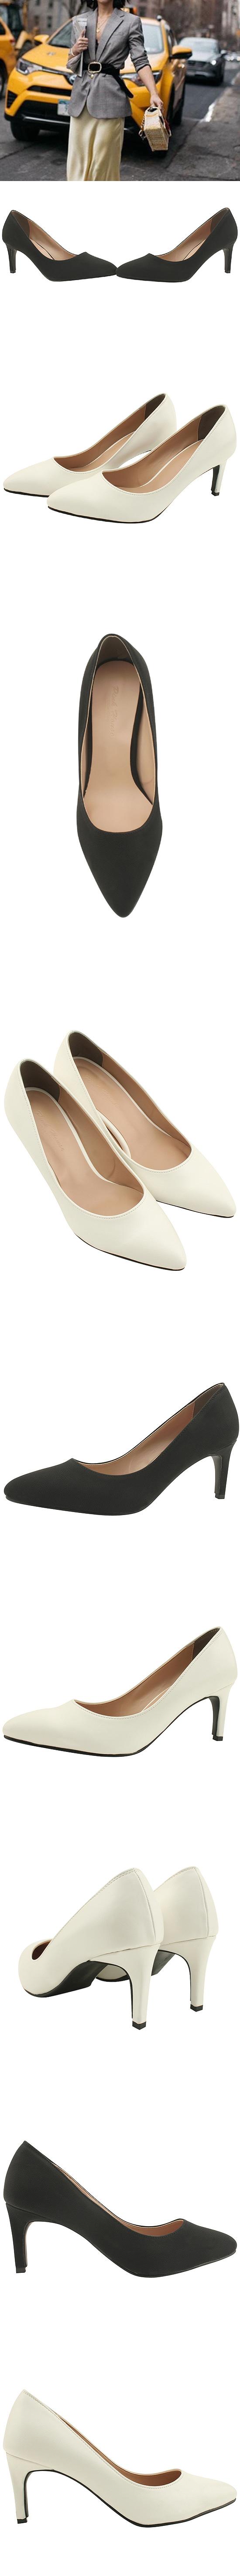 Stiletto Basic Middle Heel Shoes 7cm White